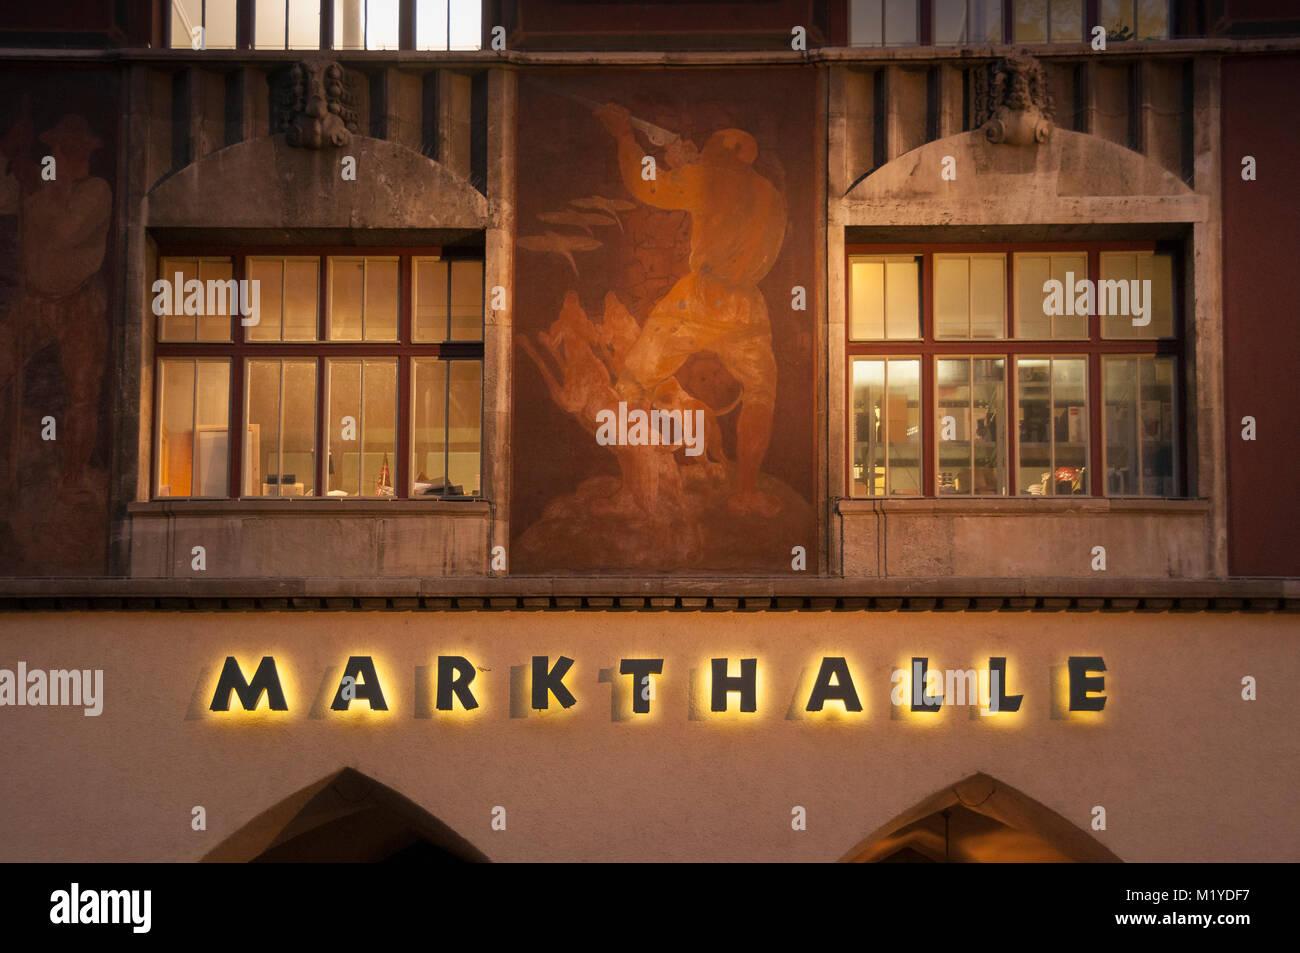 Markthalle, markethall, Stuttgart, Baden-Wuerttemberg, Deutschland, Germany, Europa - Stock Image